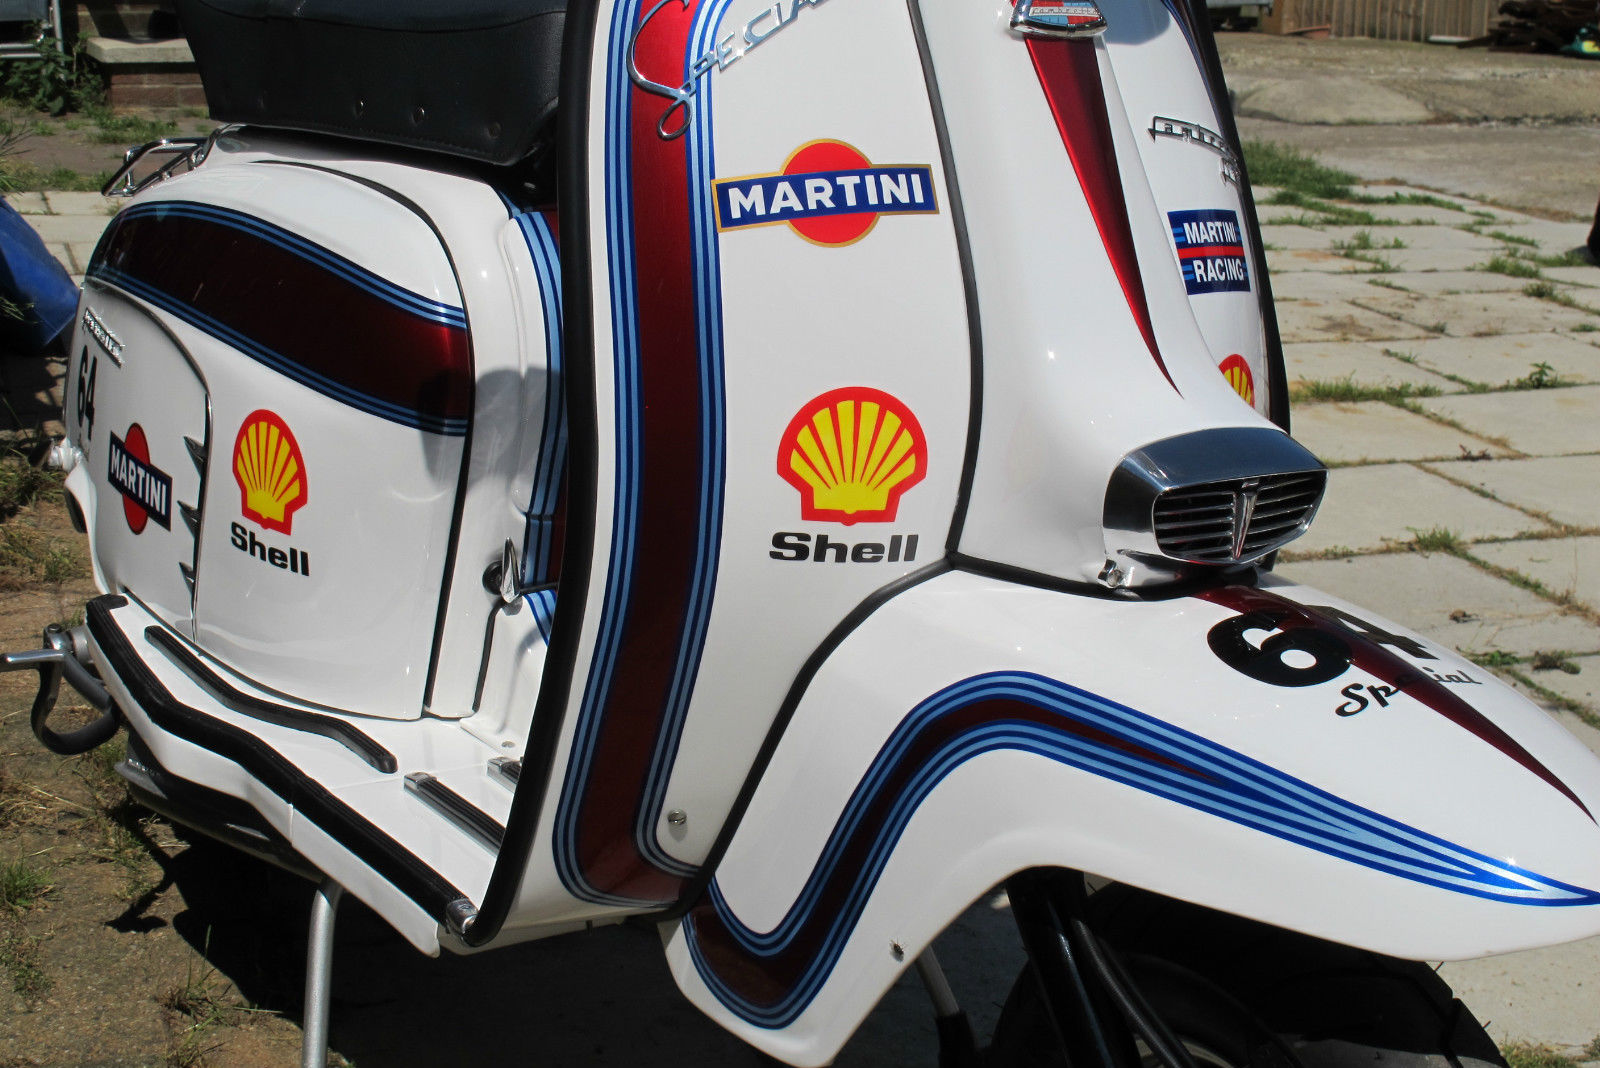 MartiniRacer-1-6-8-2014